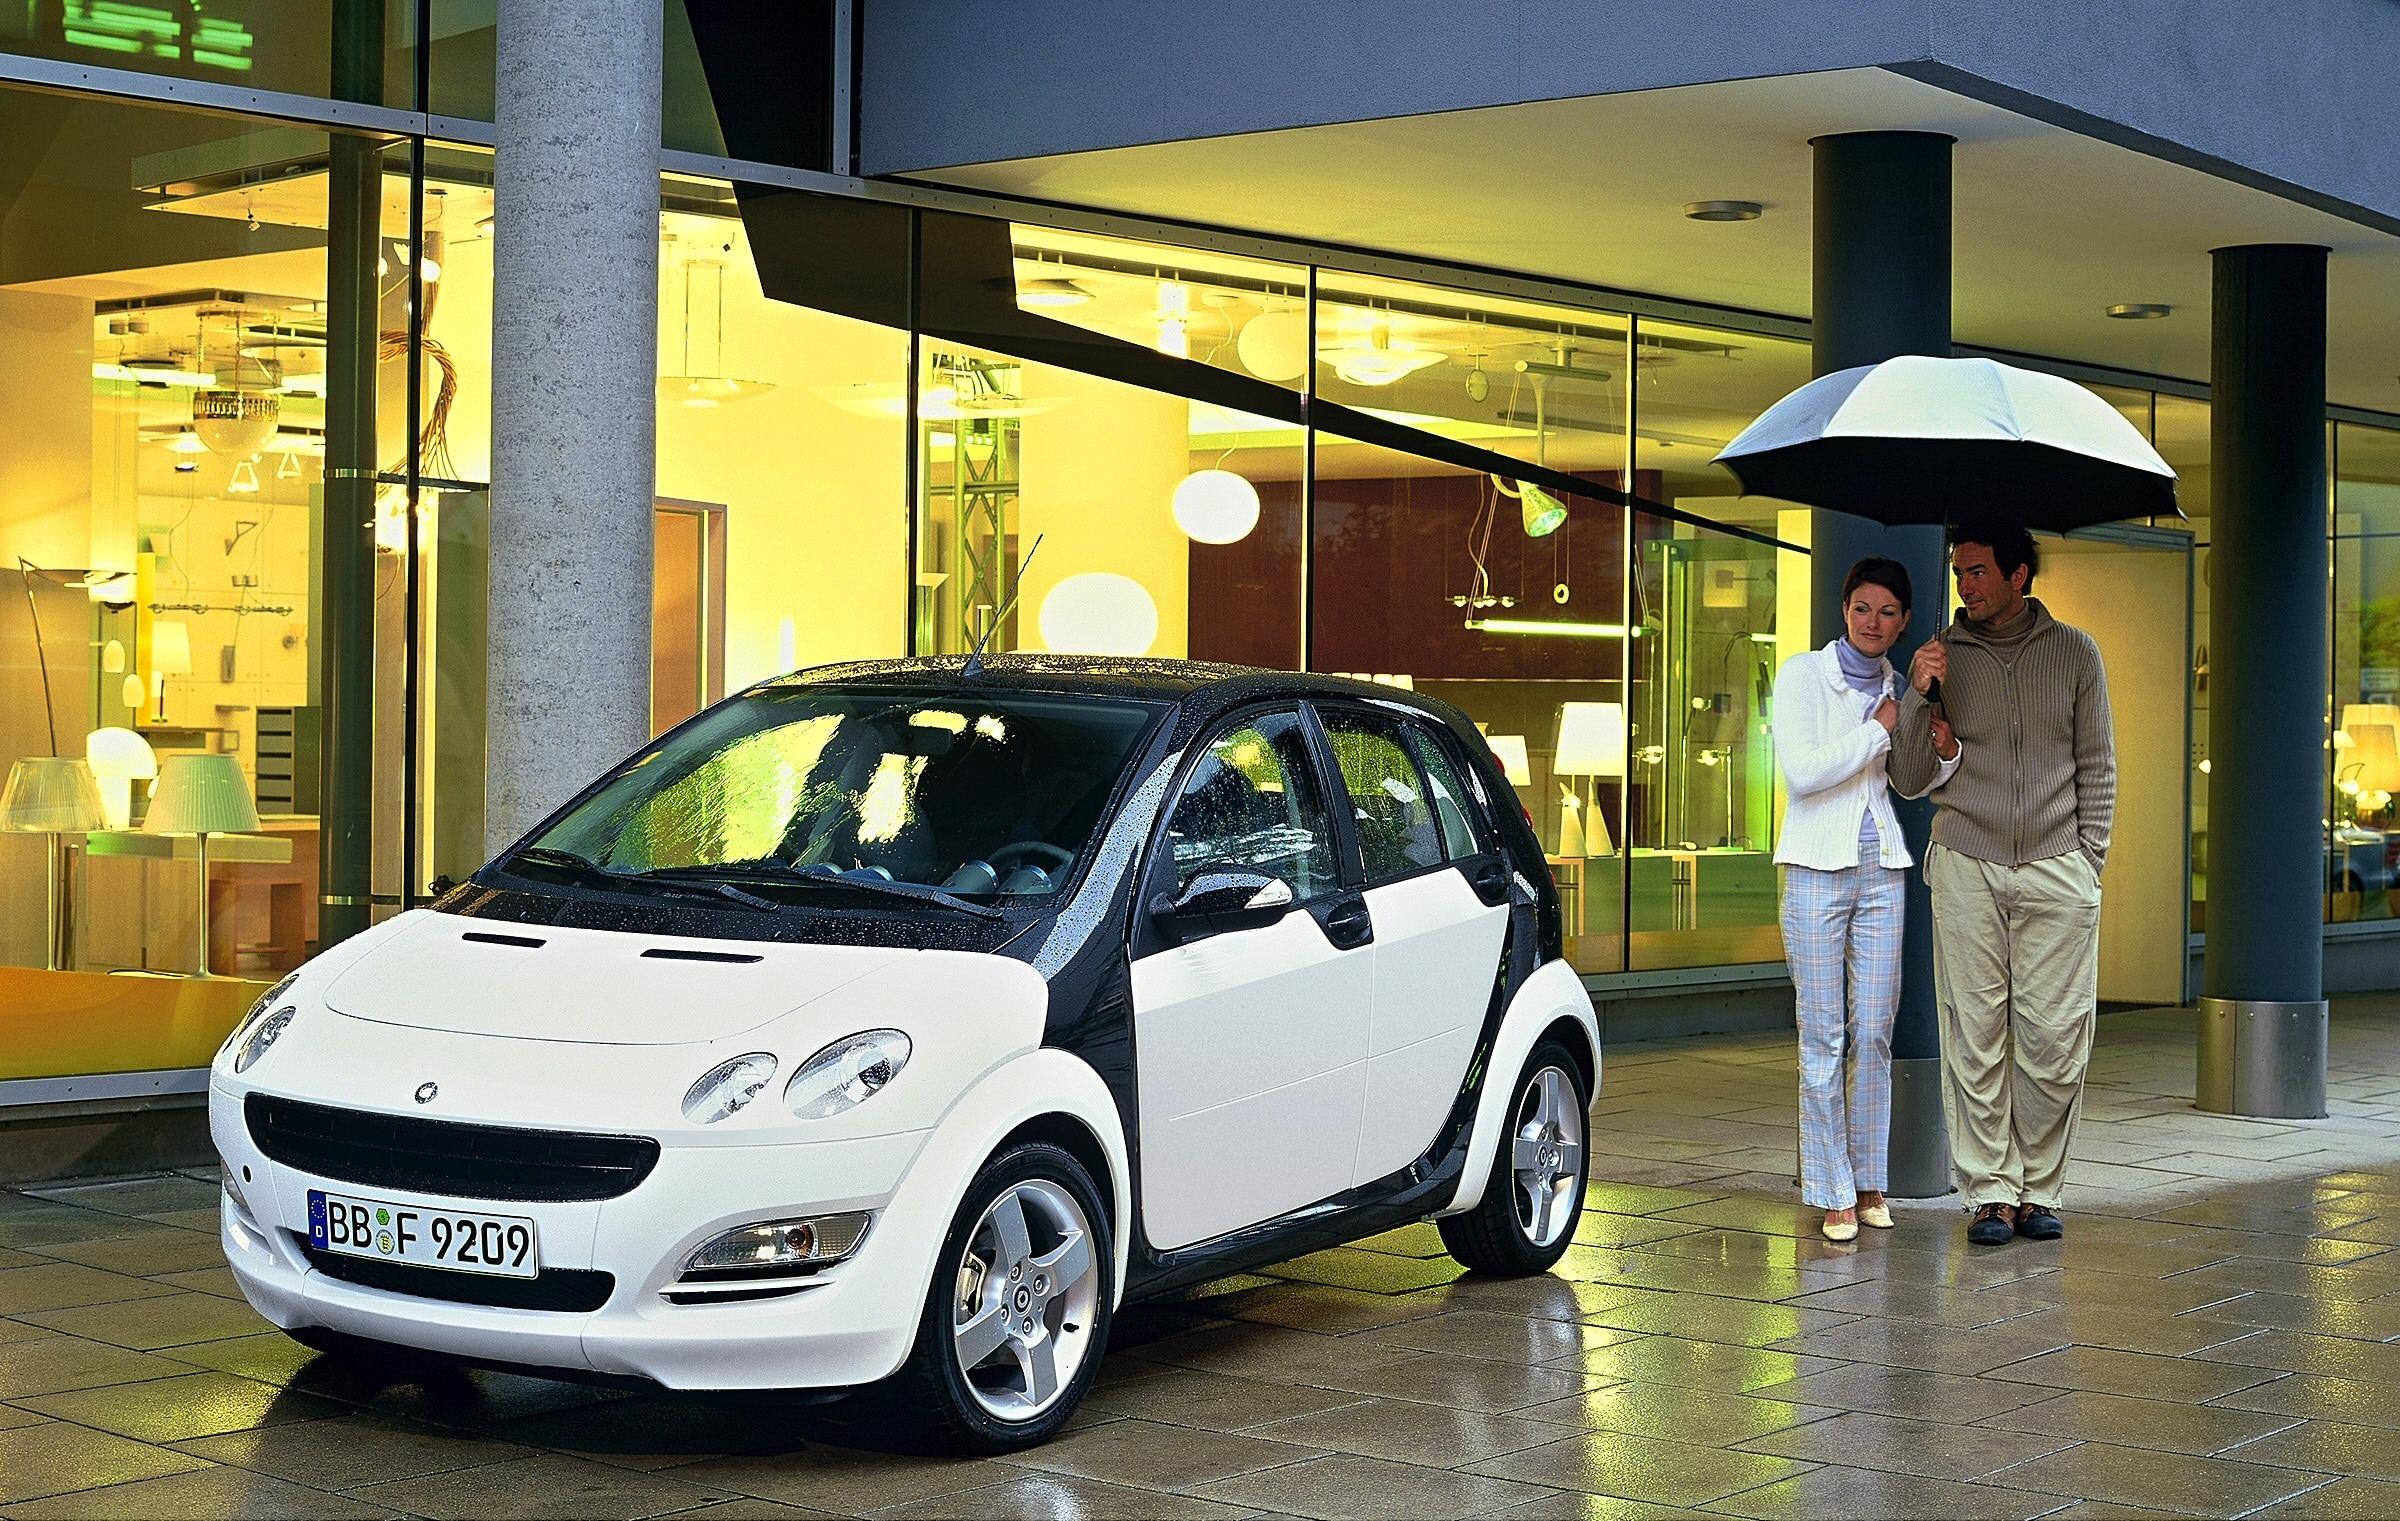 smart forfour, smart, forfour, smart car, mercedes-benz, mercedes, benz, hatchback, economy, economical car, motoring, automotive, car, cars, classic car, retro car, ebay motors, ebay, autotrader